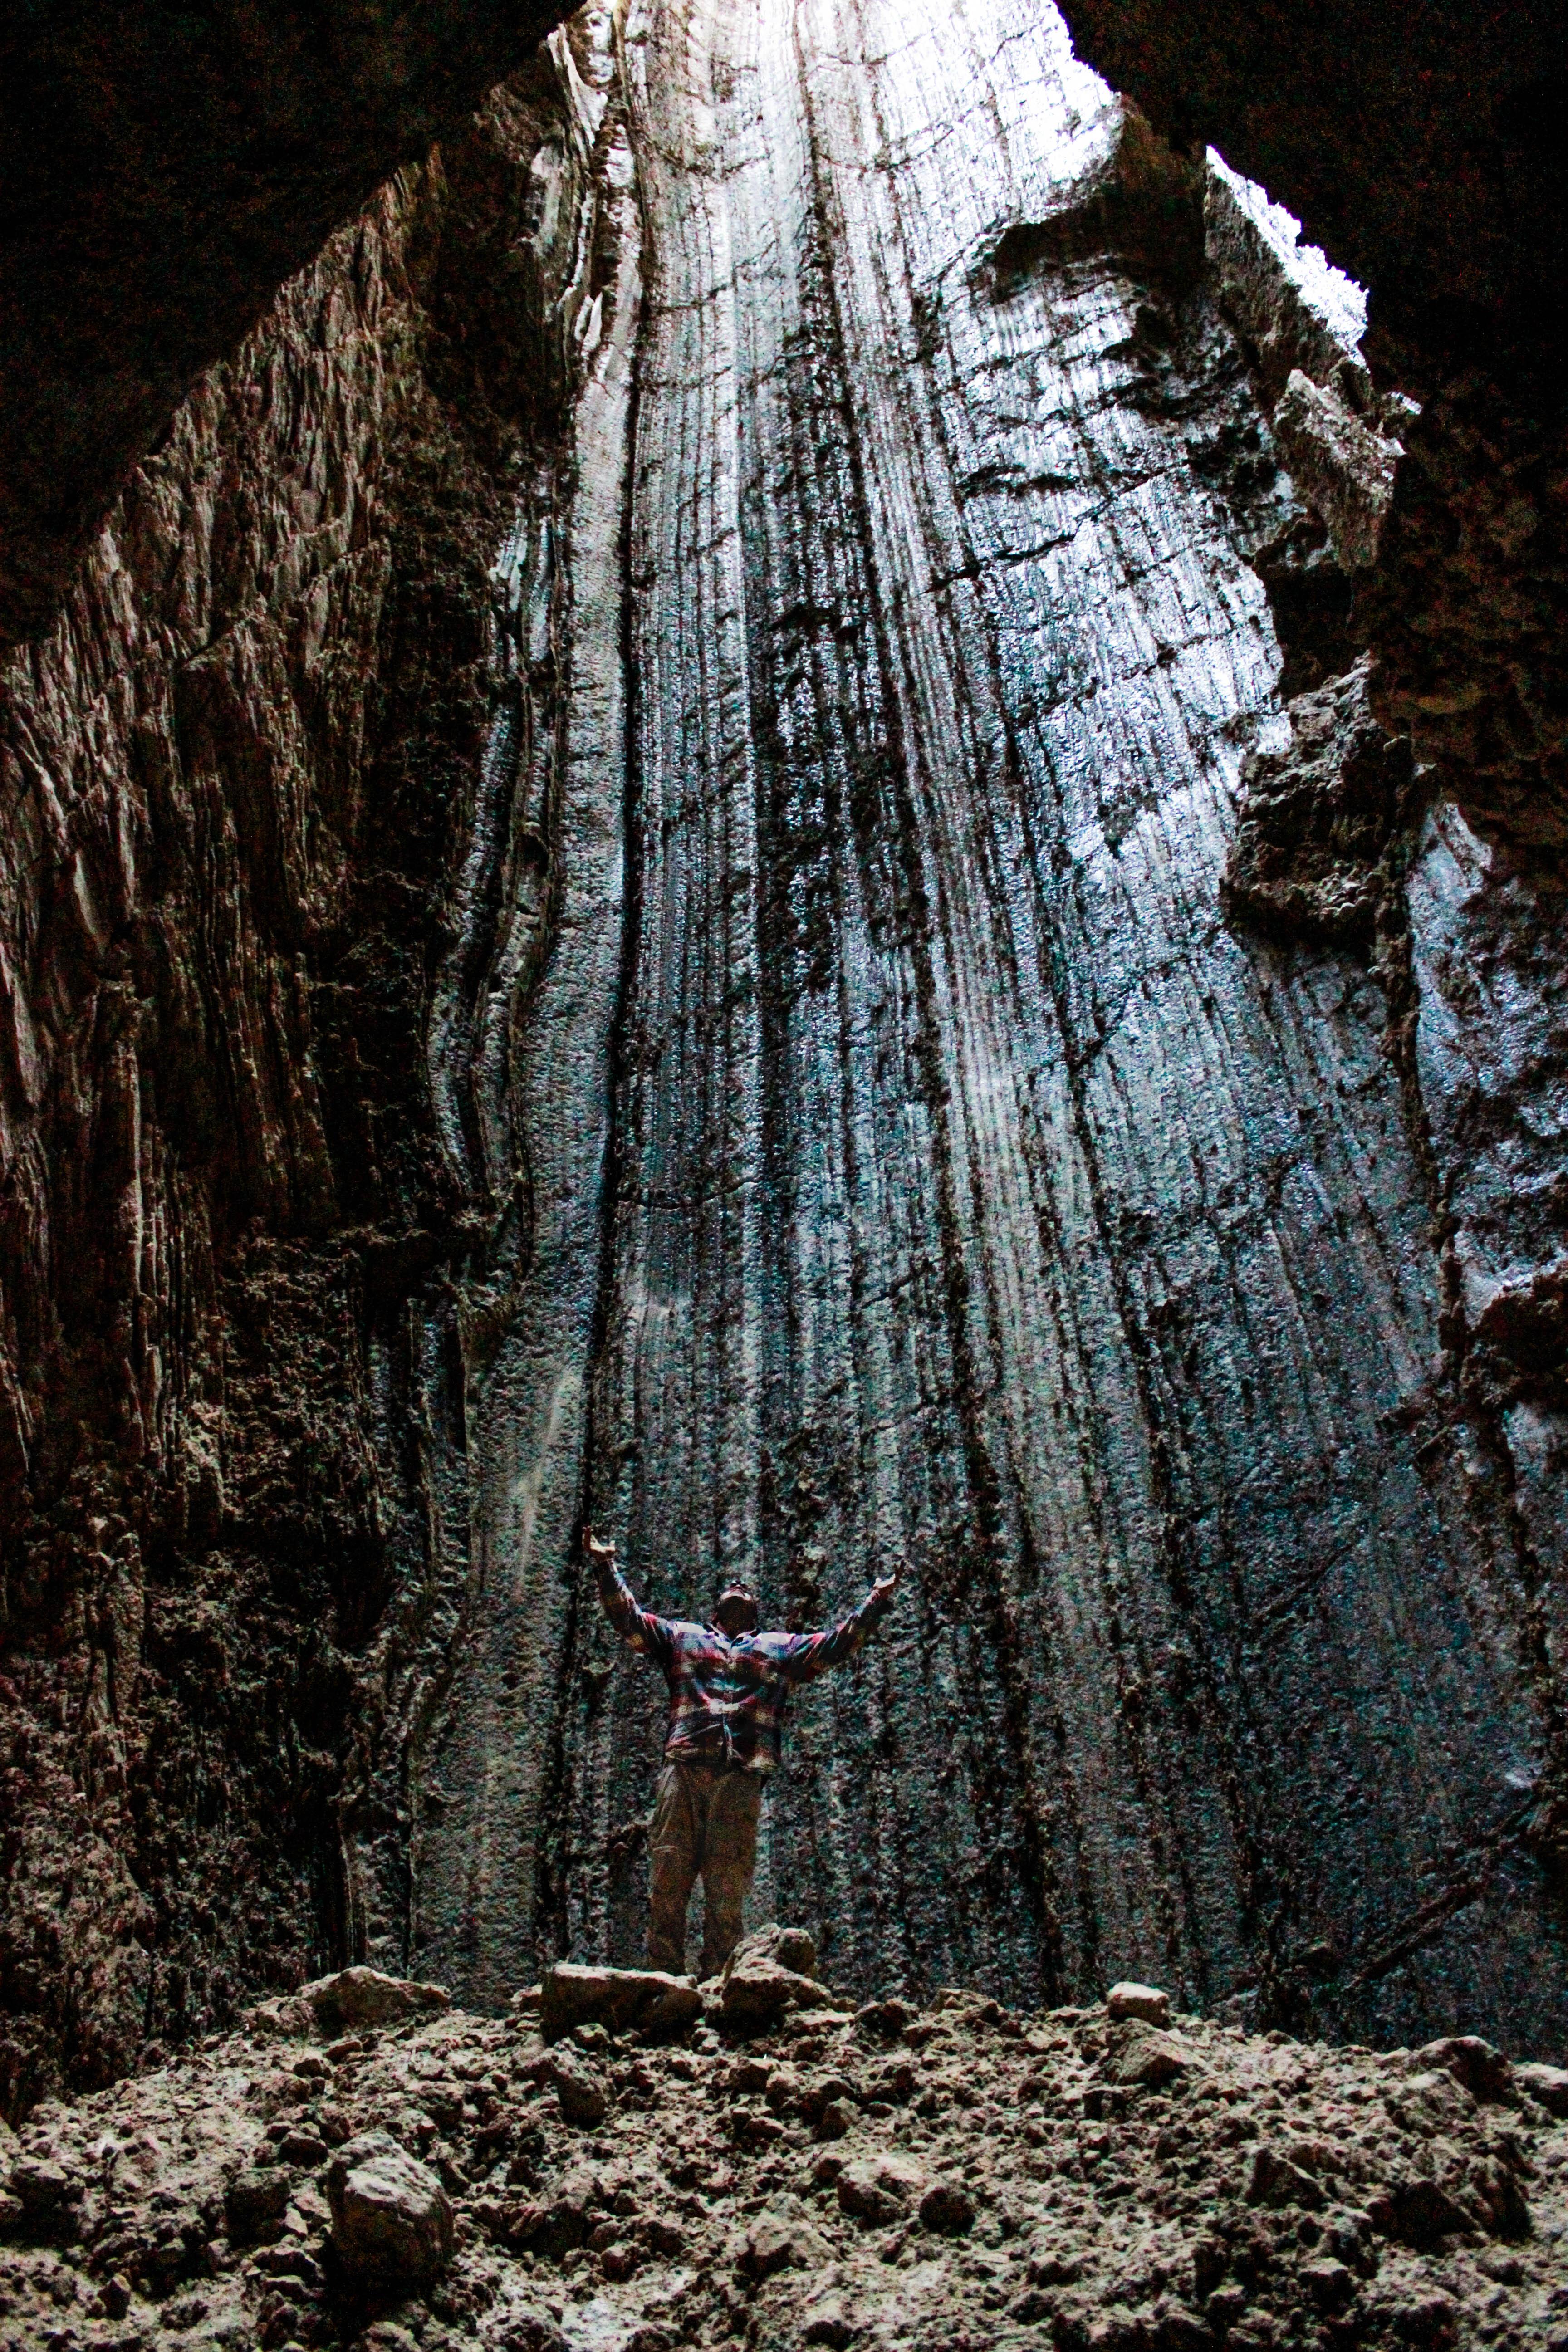 Cave photo contest 051